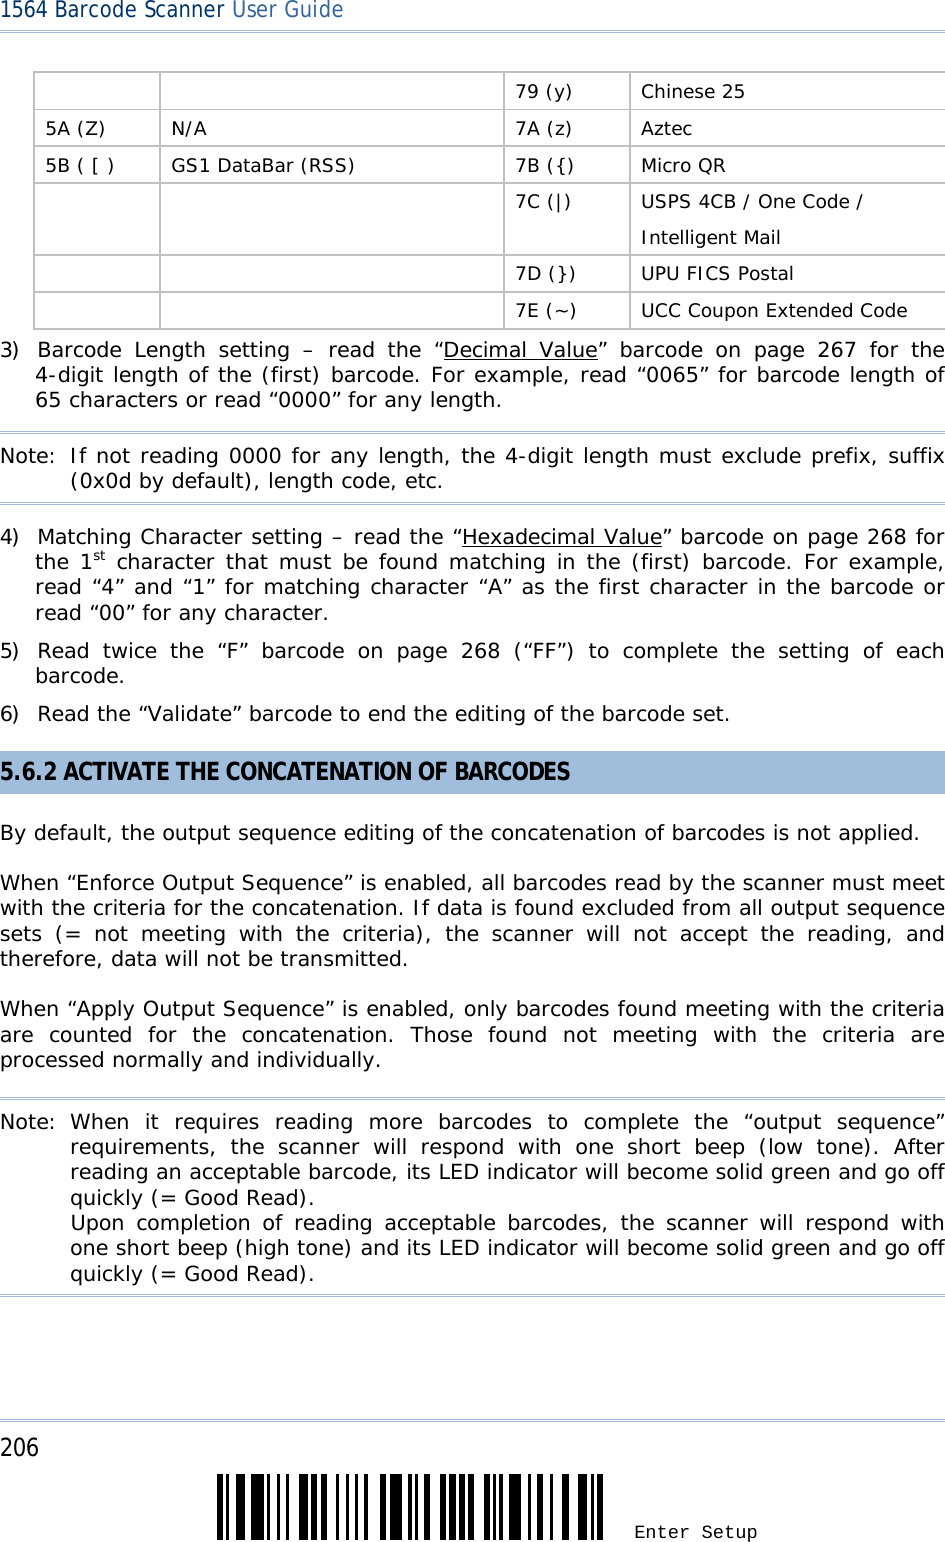 CipherLab 1564A BT Barcode Scanner User Manual